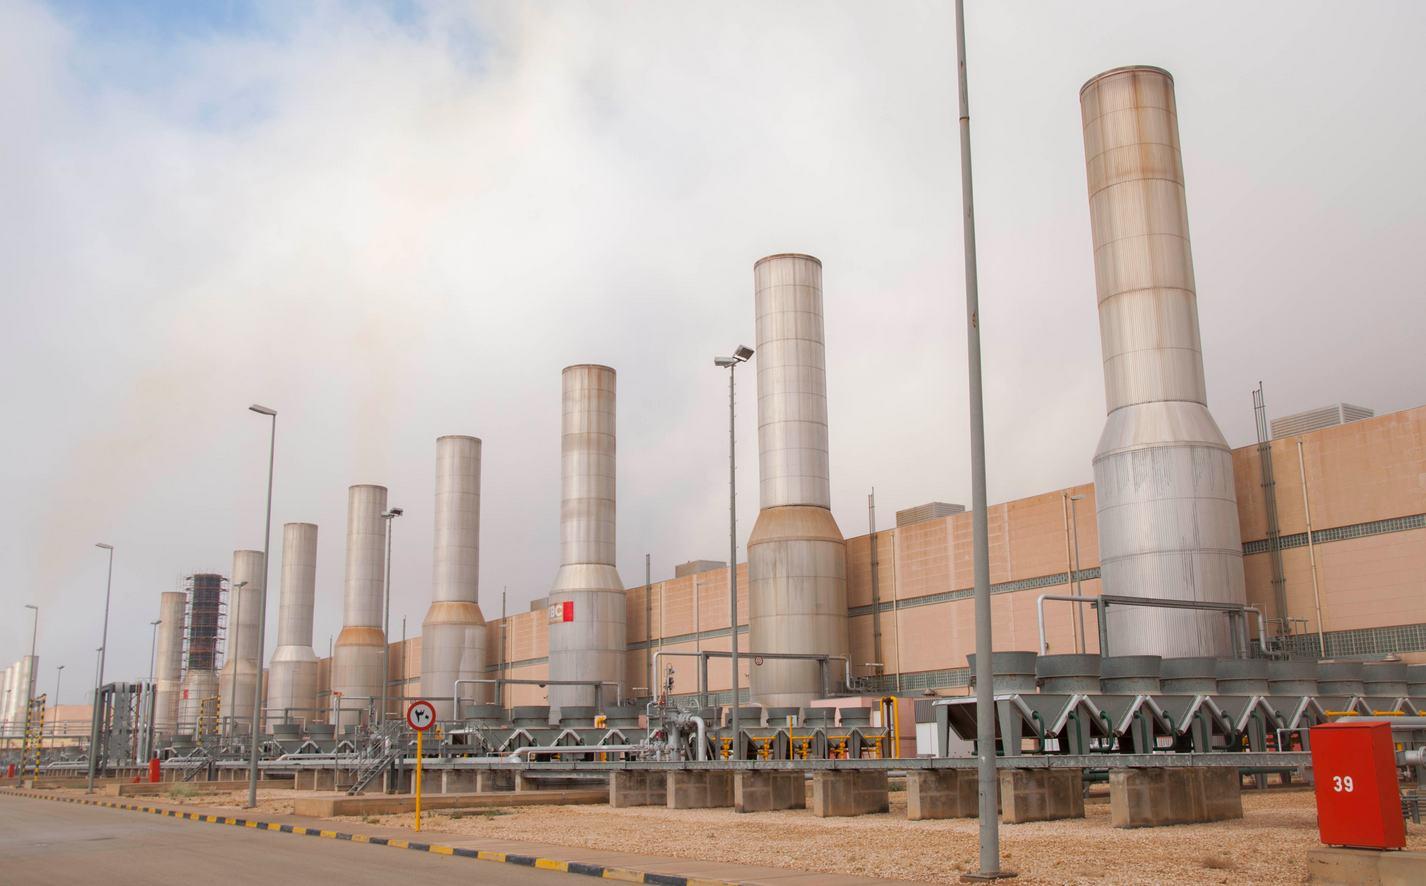 Jeddah Power Plant Saudi Arabia Adexsi Uk